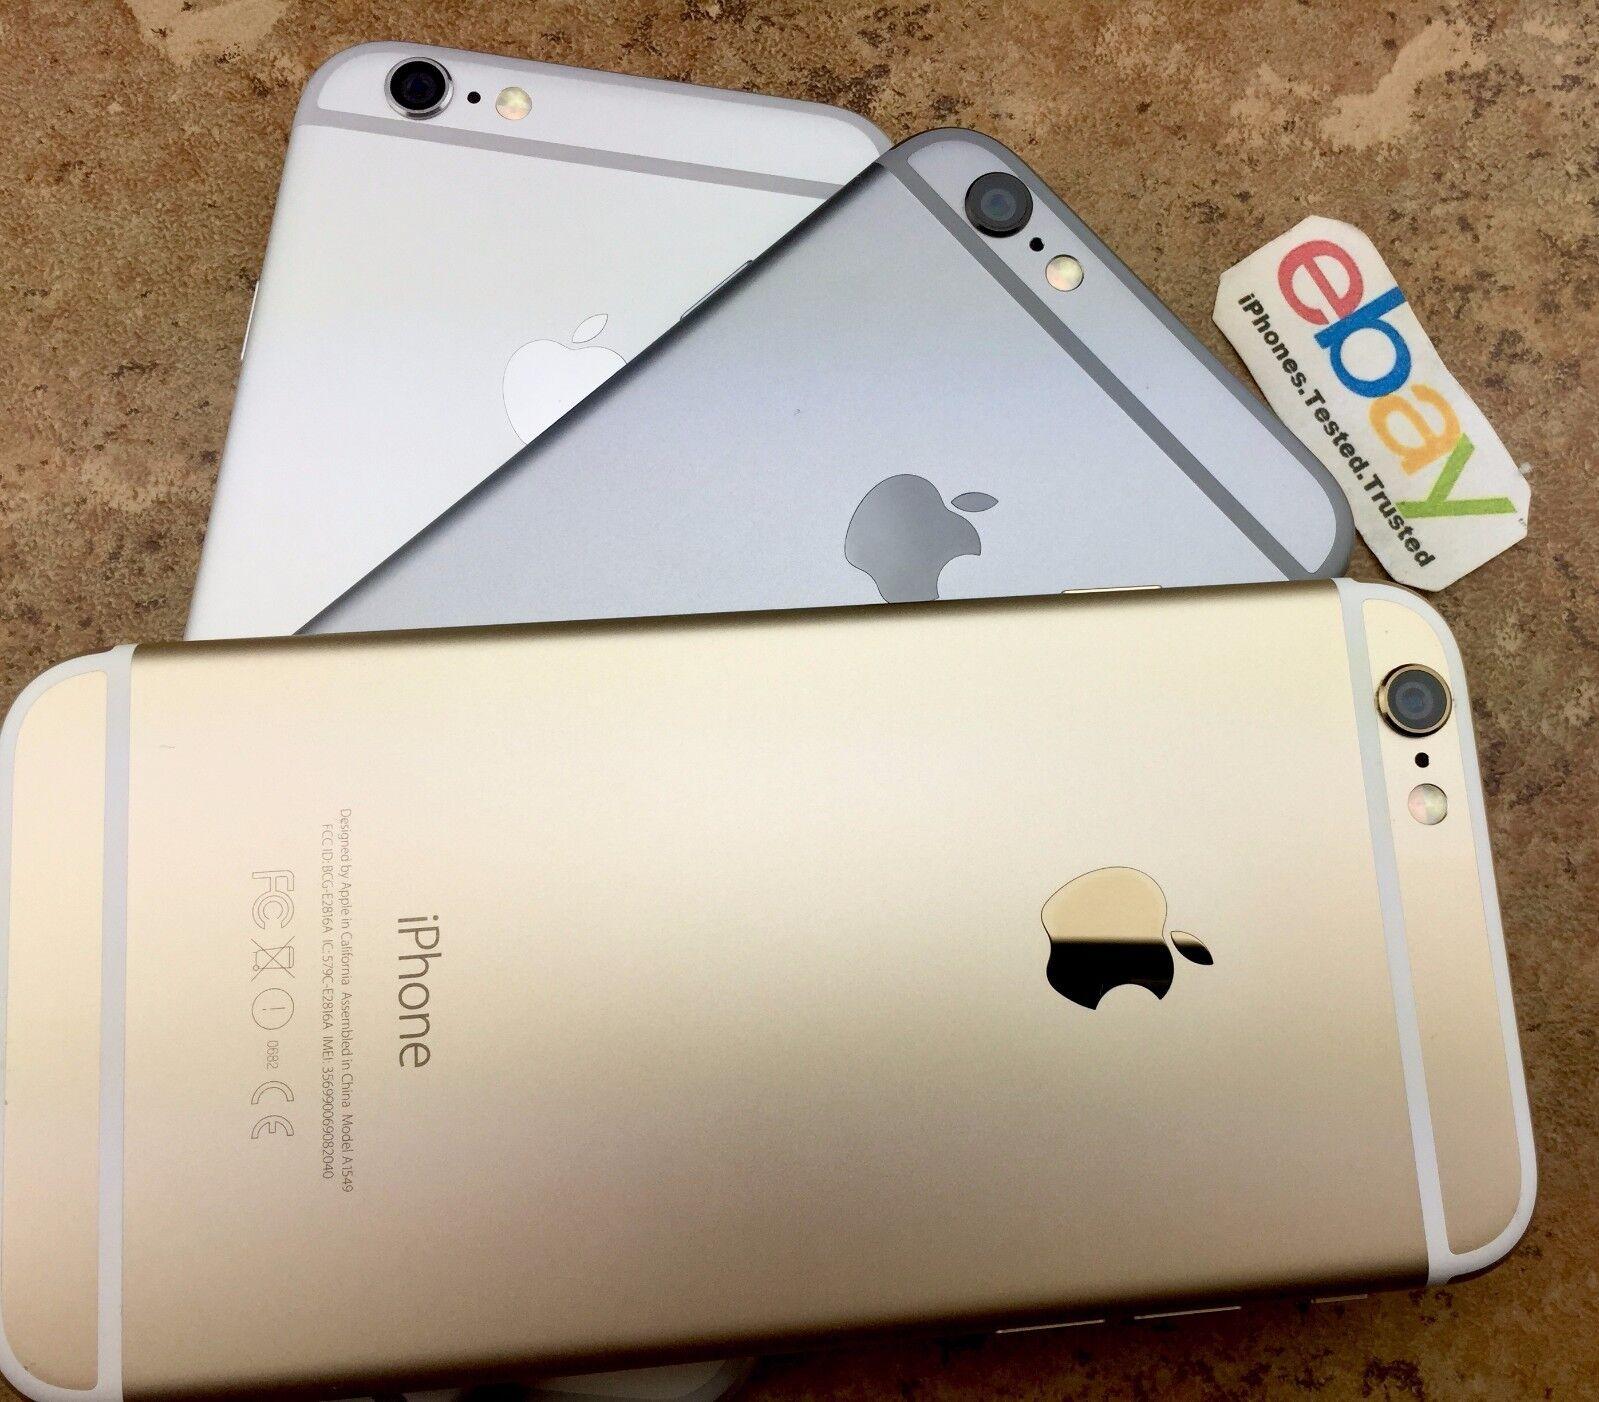 Factory Unlocked Apple iPhone 6 Gold Silver Space Gray ATT TMobile 16/64GB/128GB